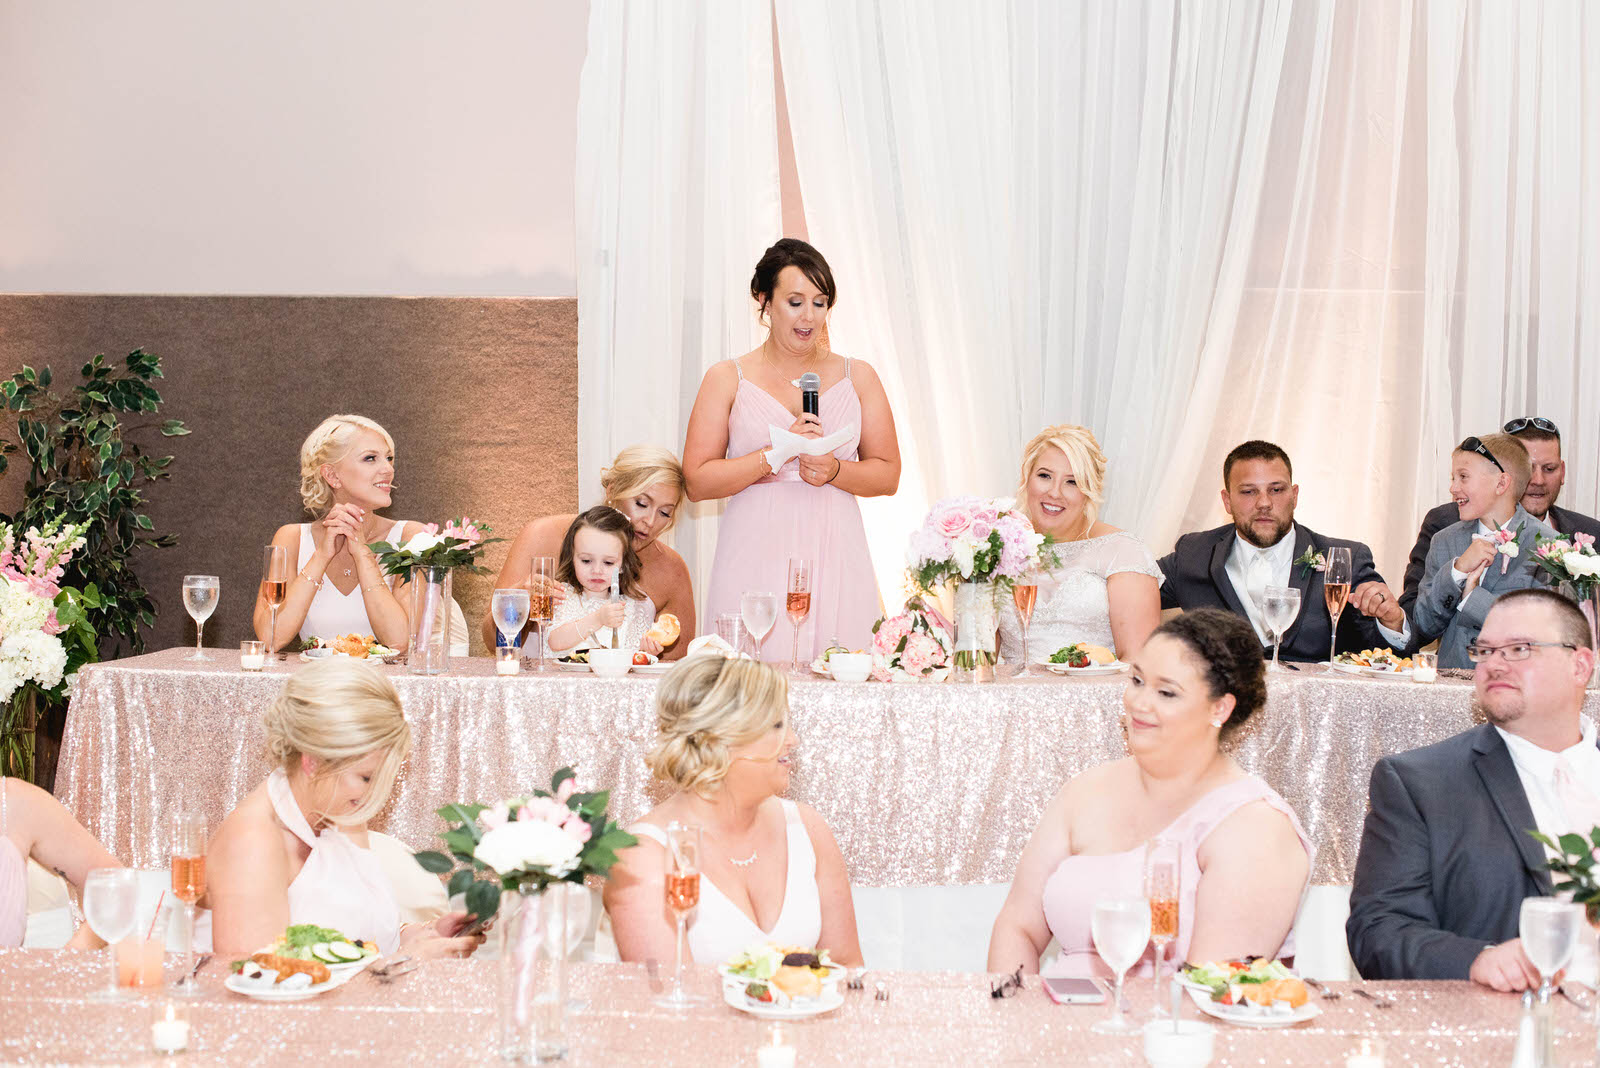 weddings-at-Holy-Cross-Greek-Orthodox-Church-and-Hall-69.jpg